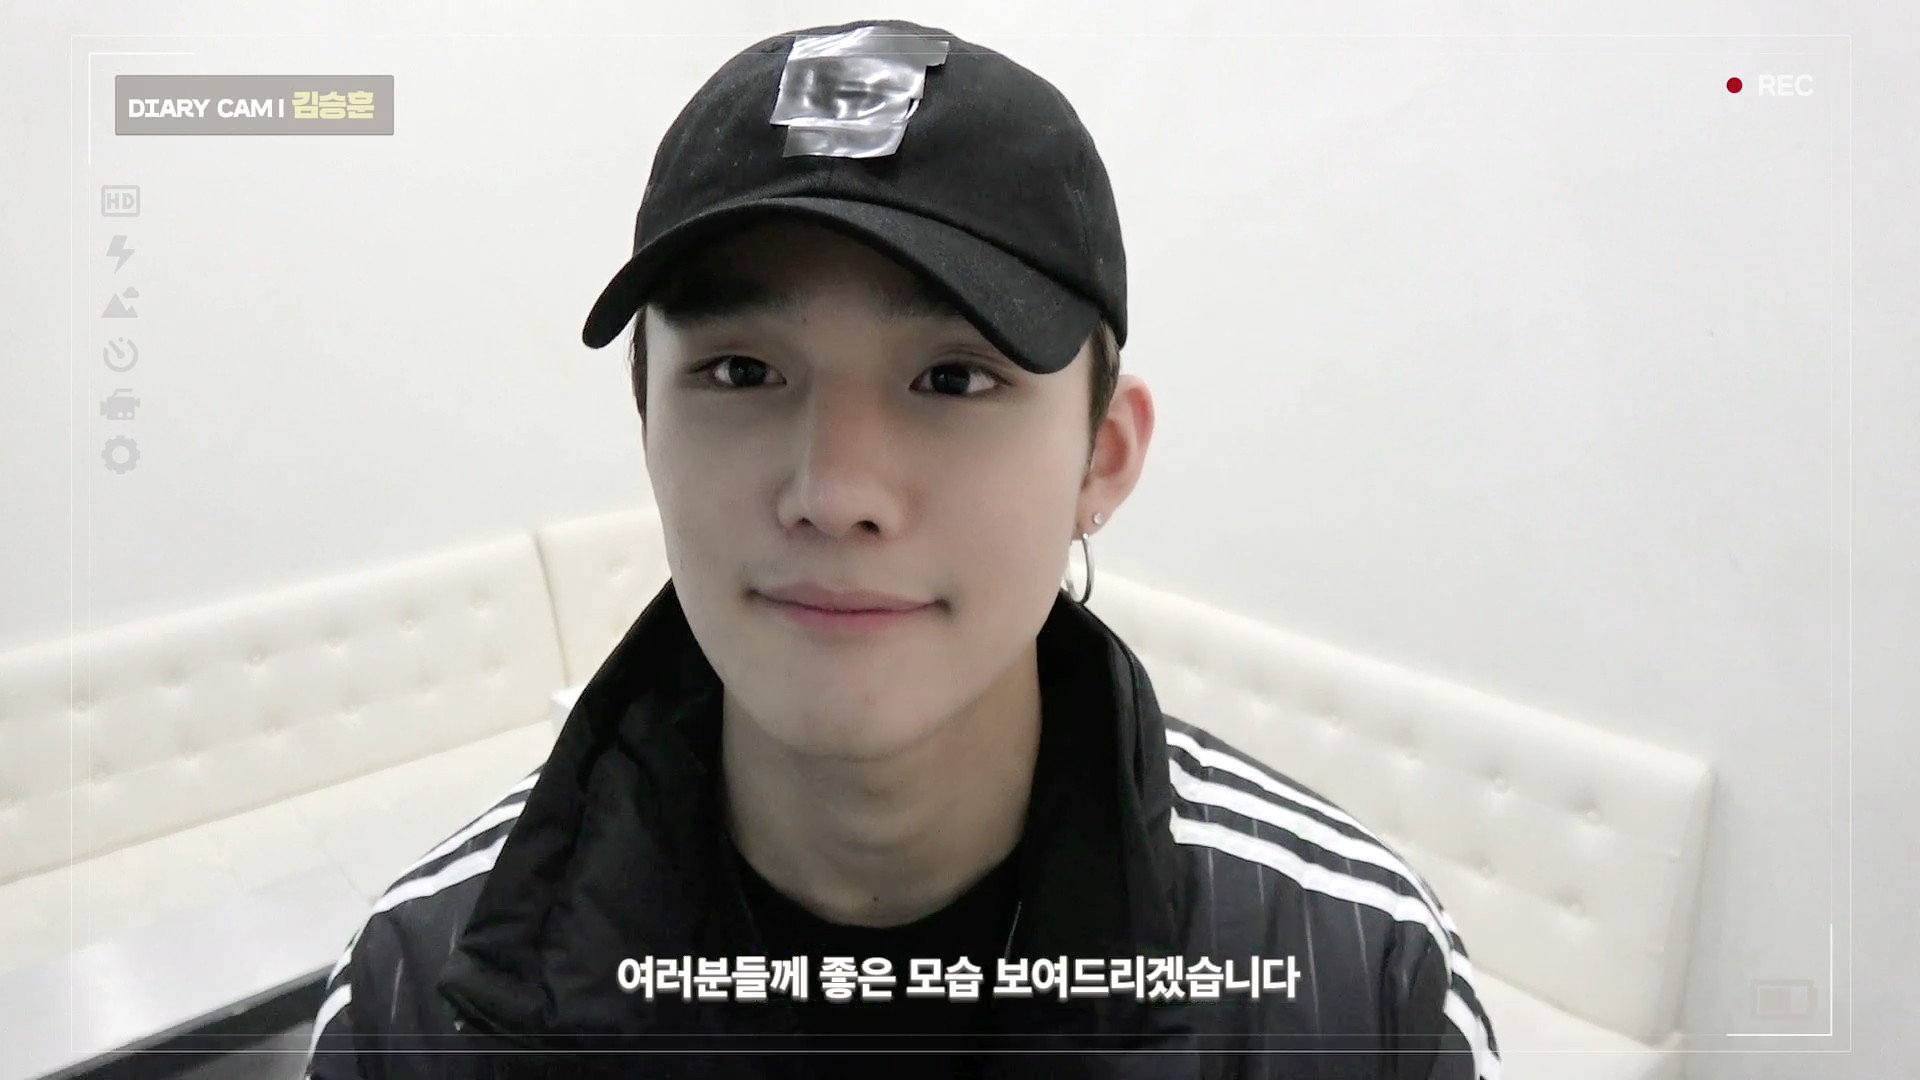 [DIARY CAM 5] 김승훈 <KIM SEUNGHUN> l YG보석함